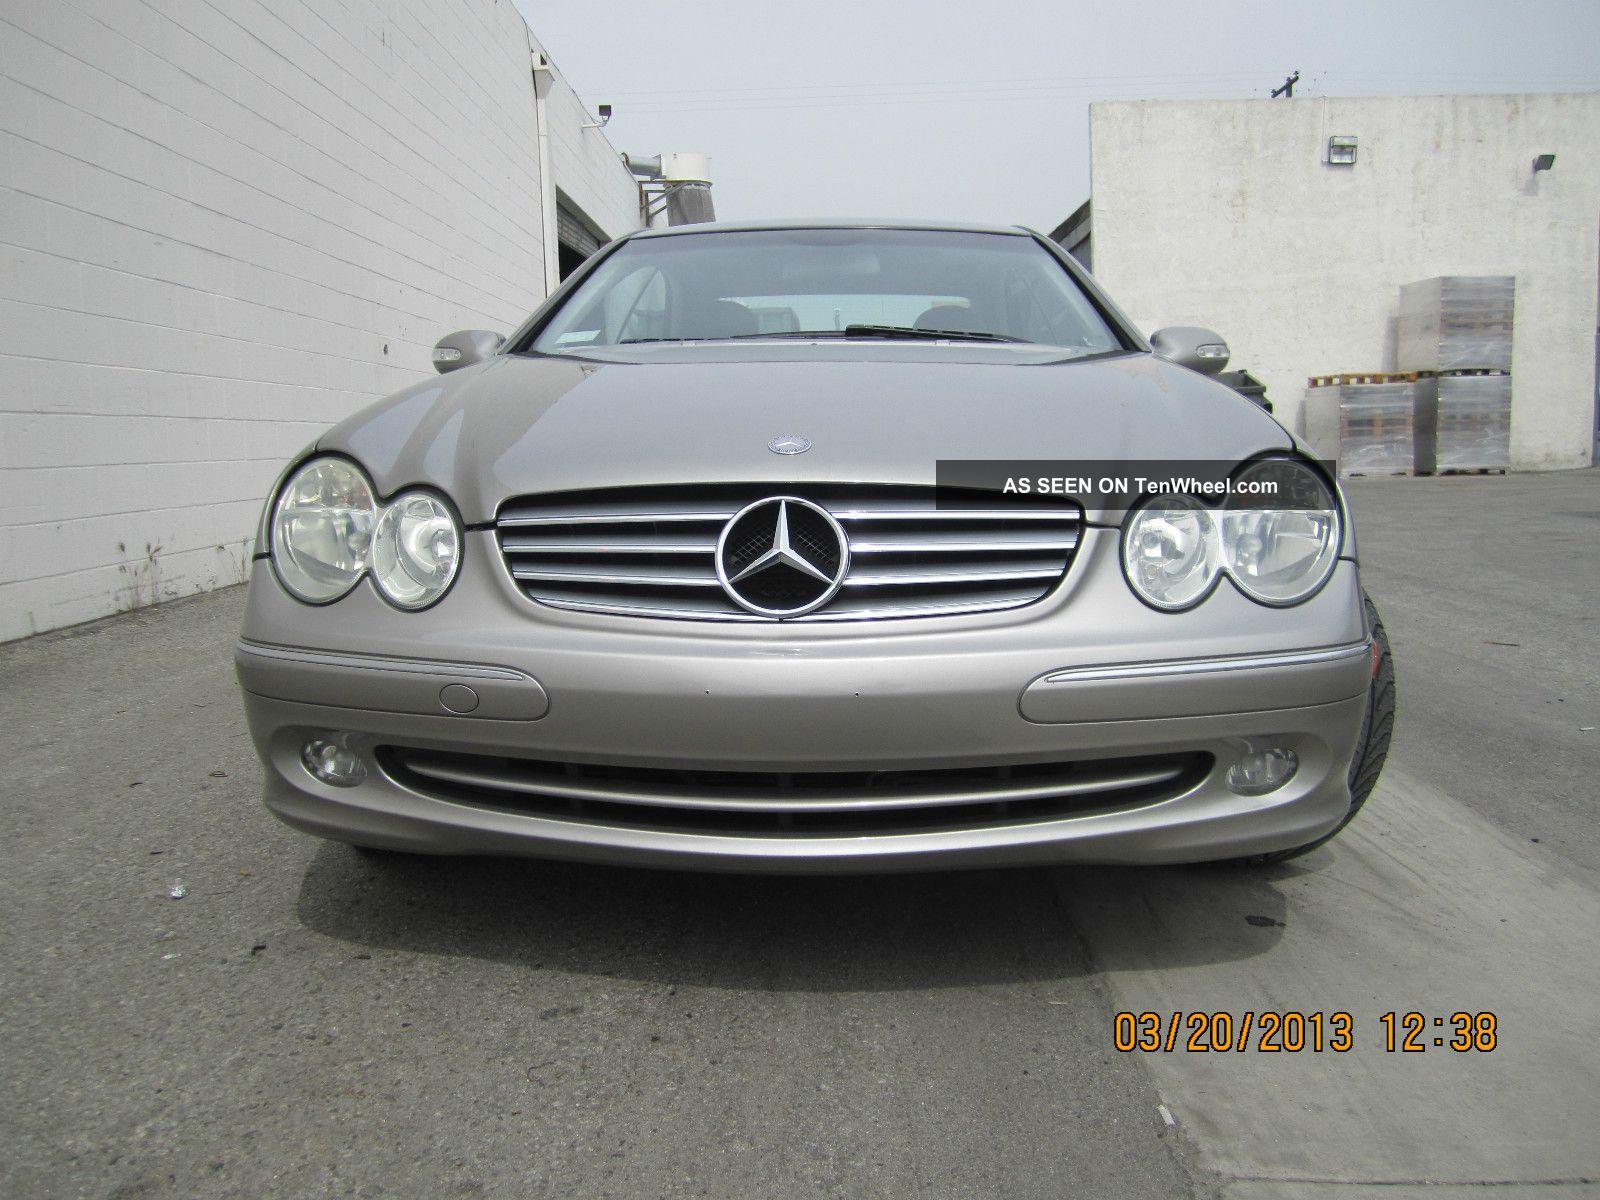 2004 Mercedes Benz Clk320 Base Coupe 2 Door 3. 2l CLK Class photo #655C47